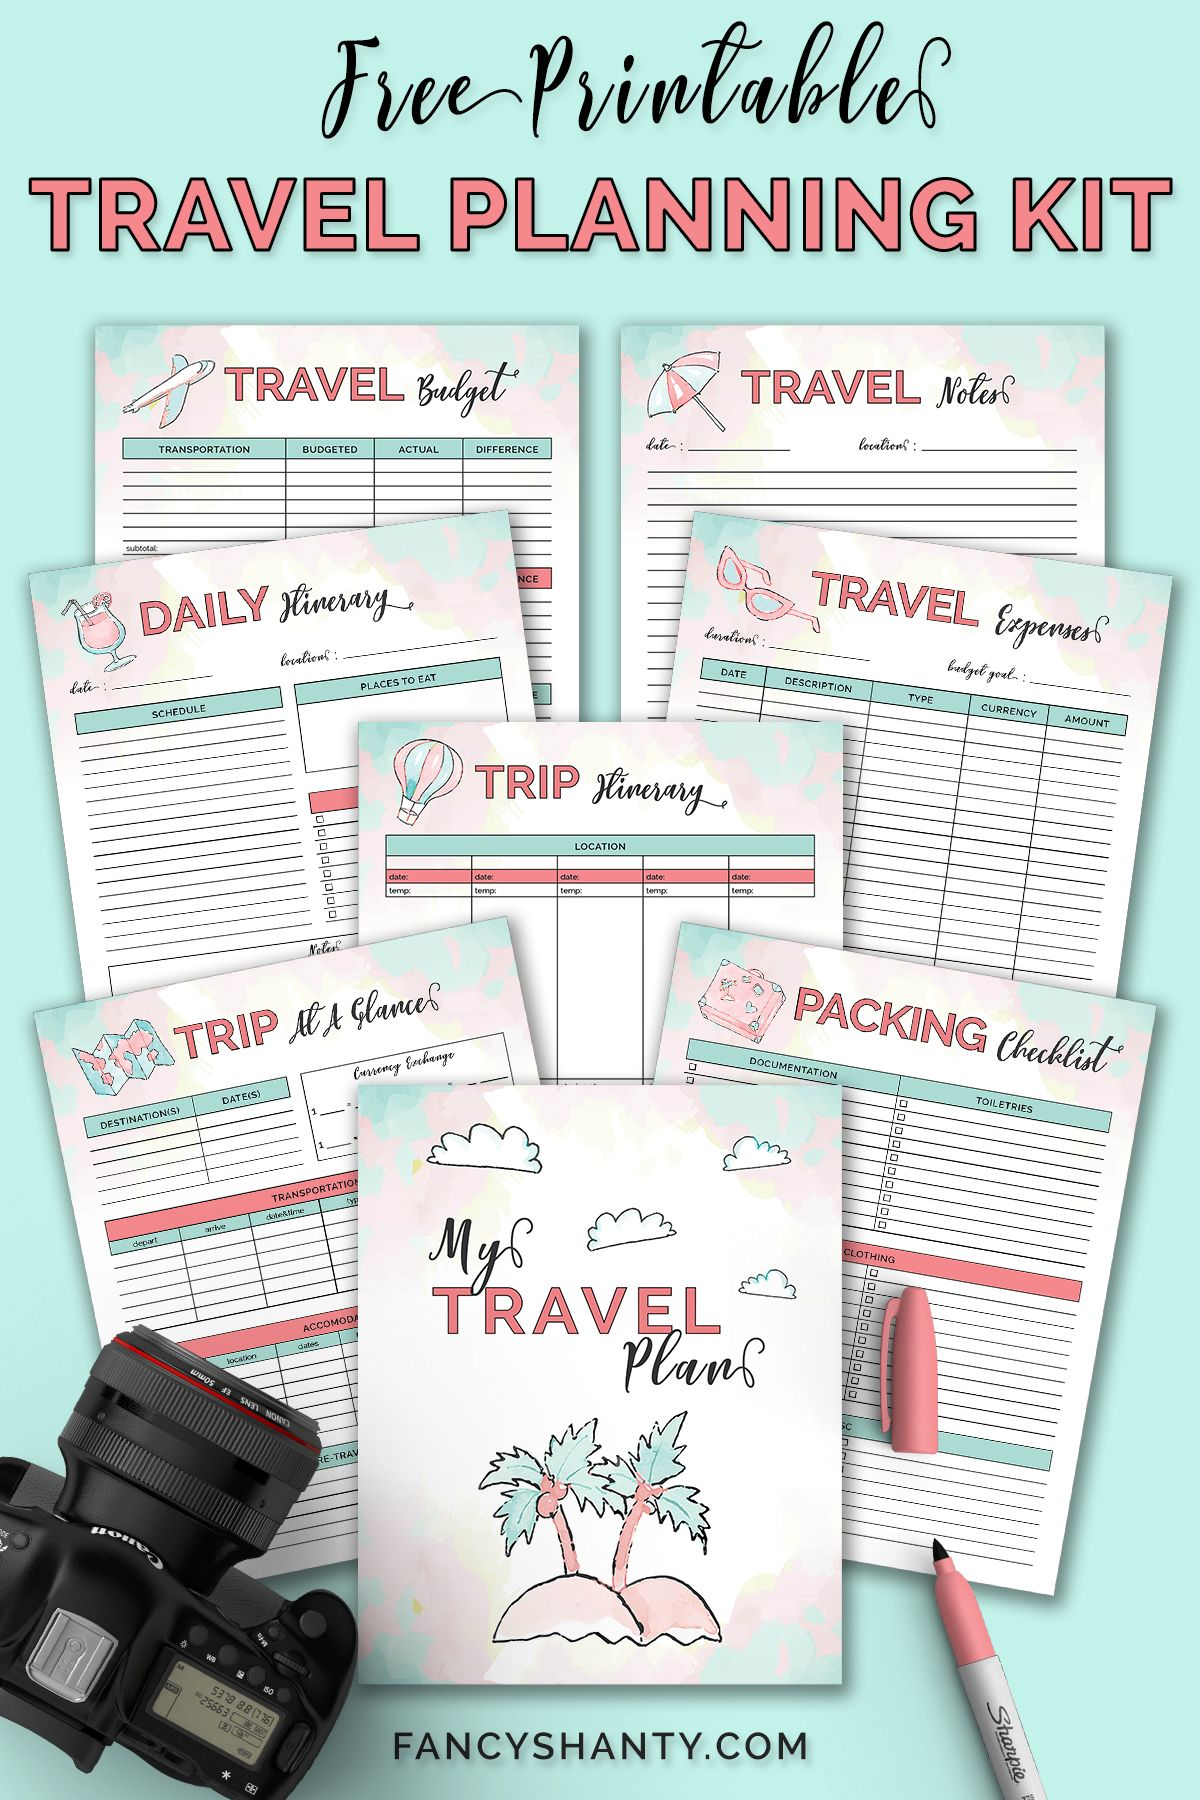 Free Printable Travel Planner Travel